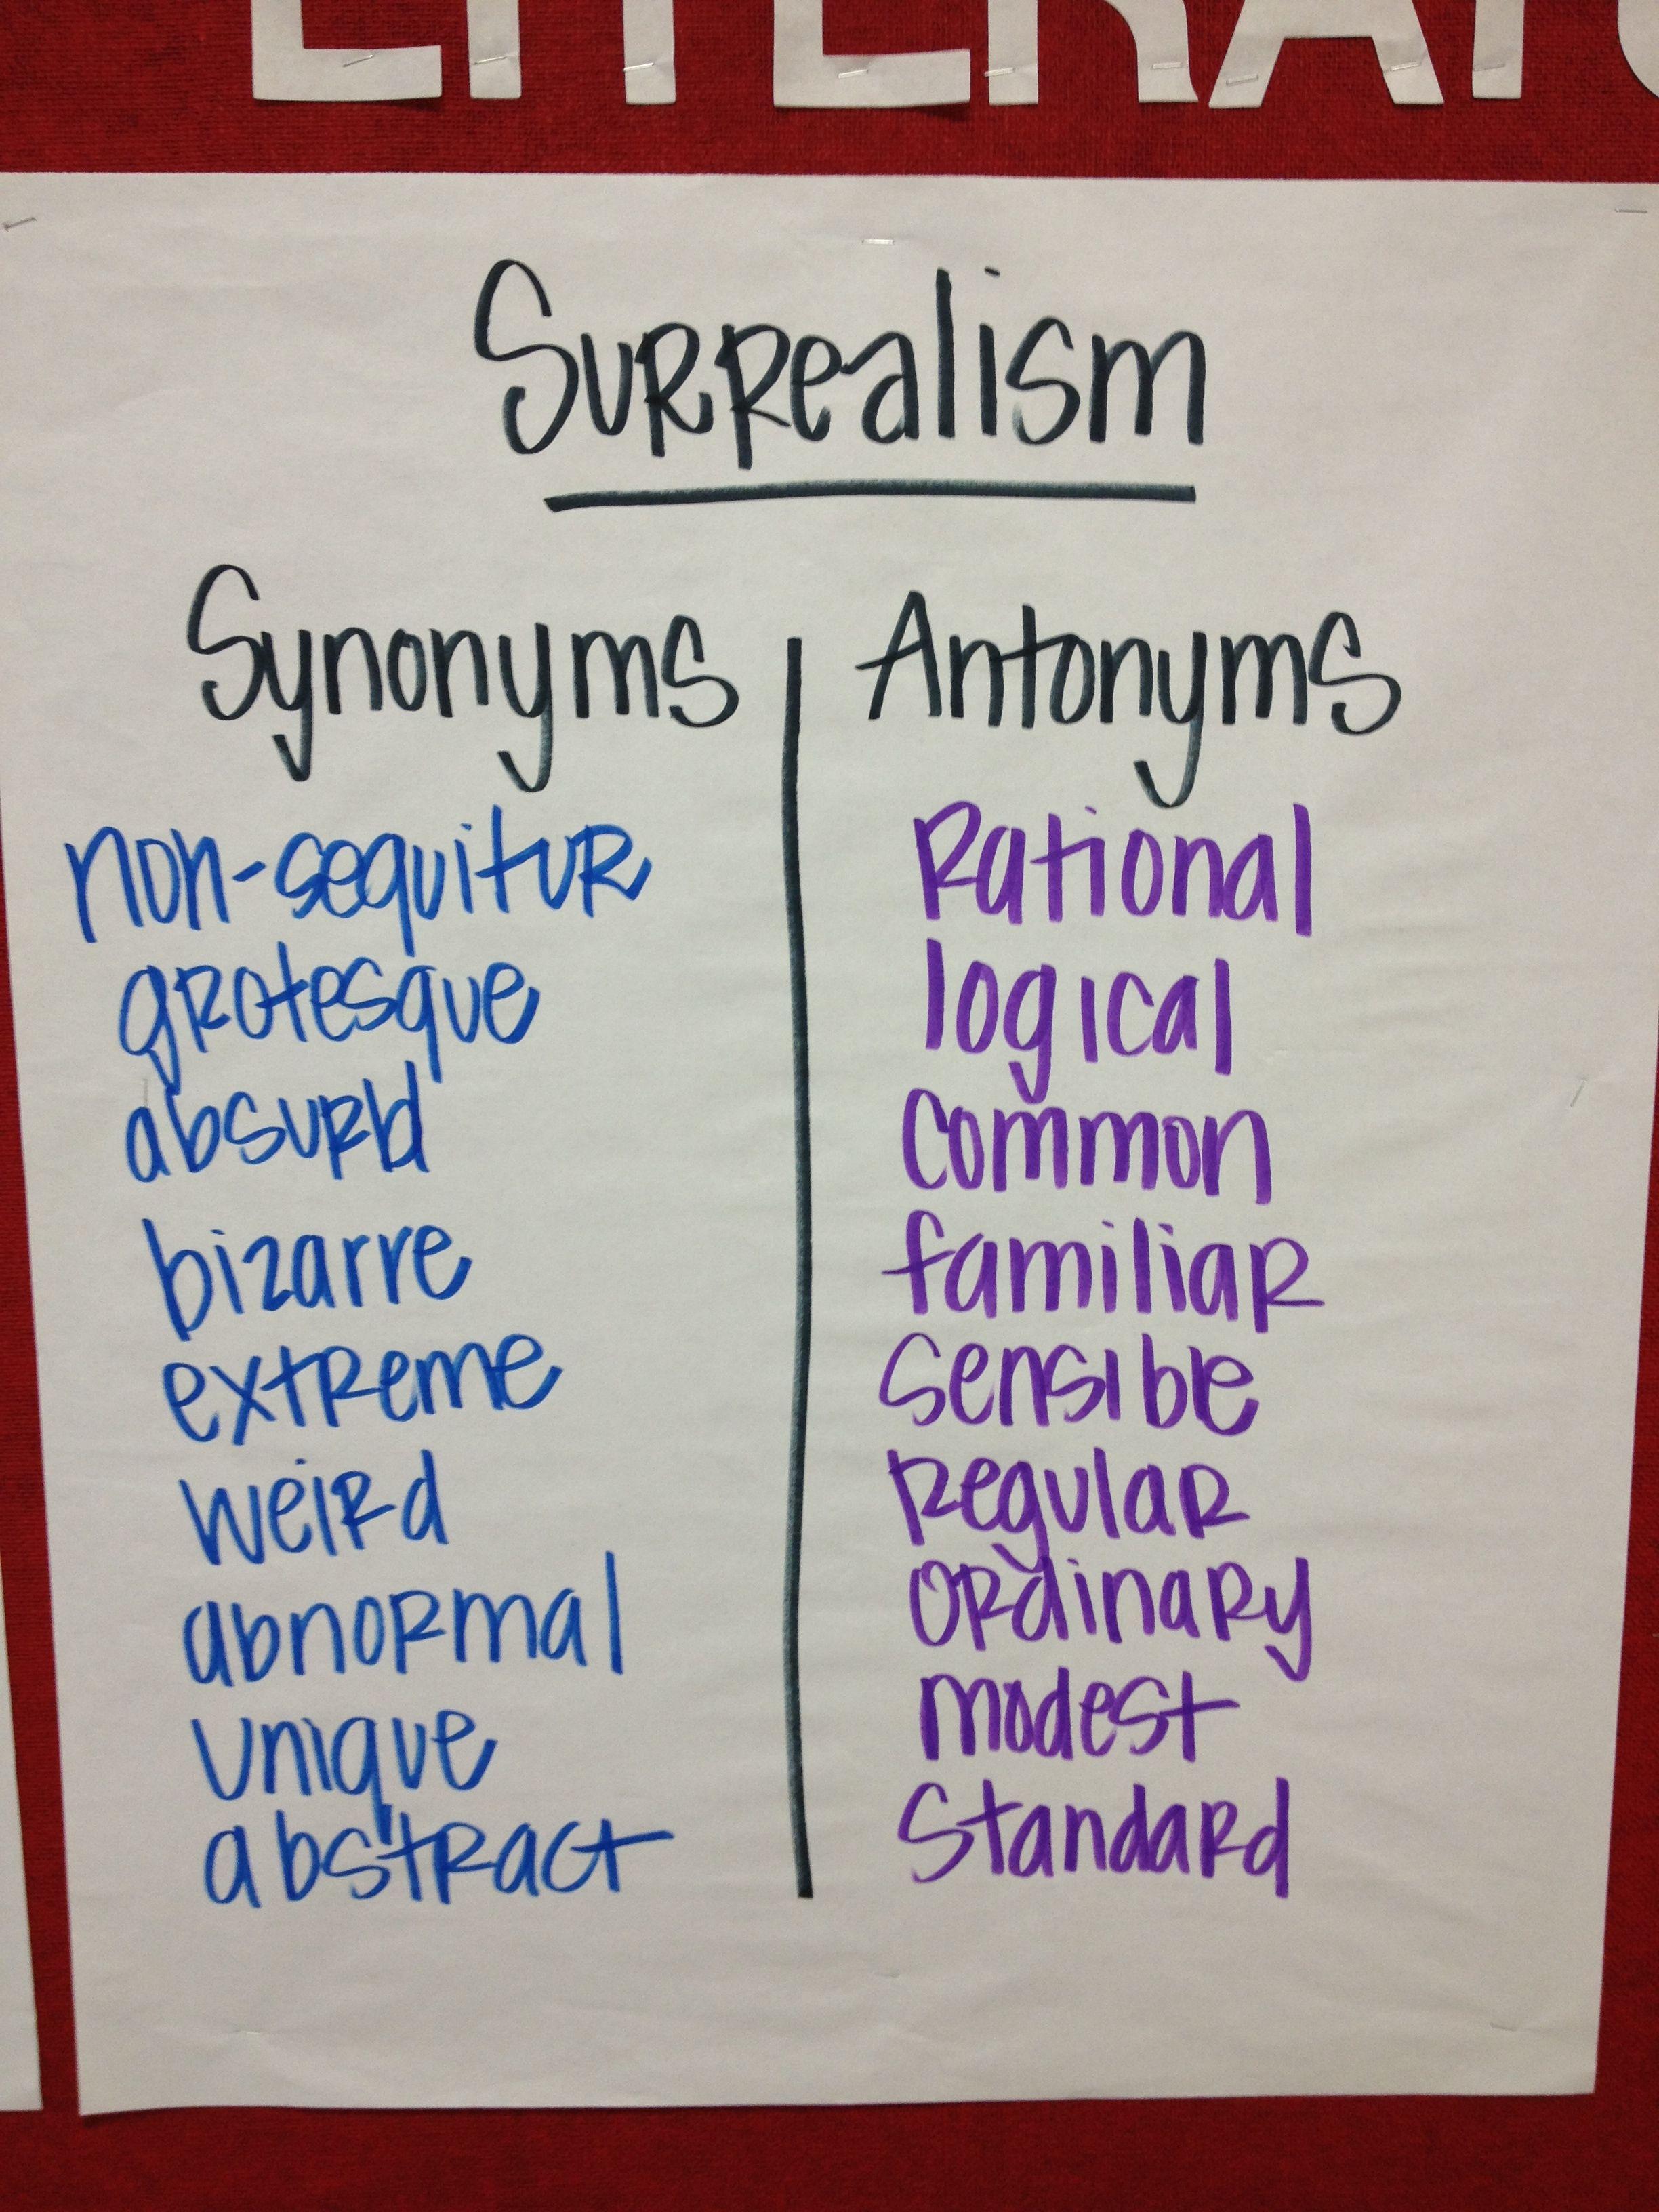 Metamorphosis Surrealism anchor chart | High School ... - photo#37